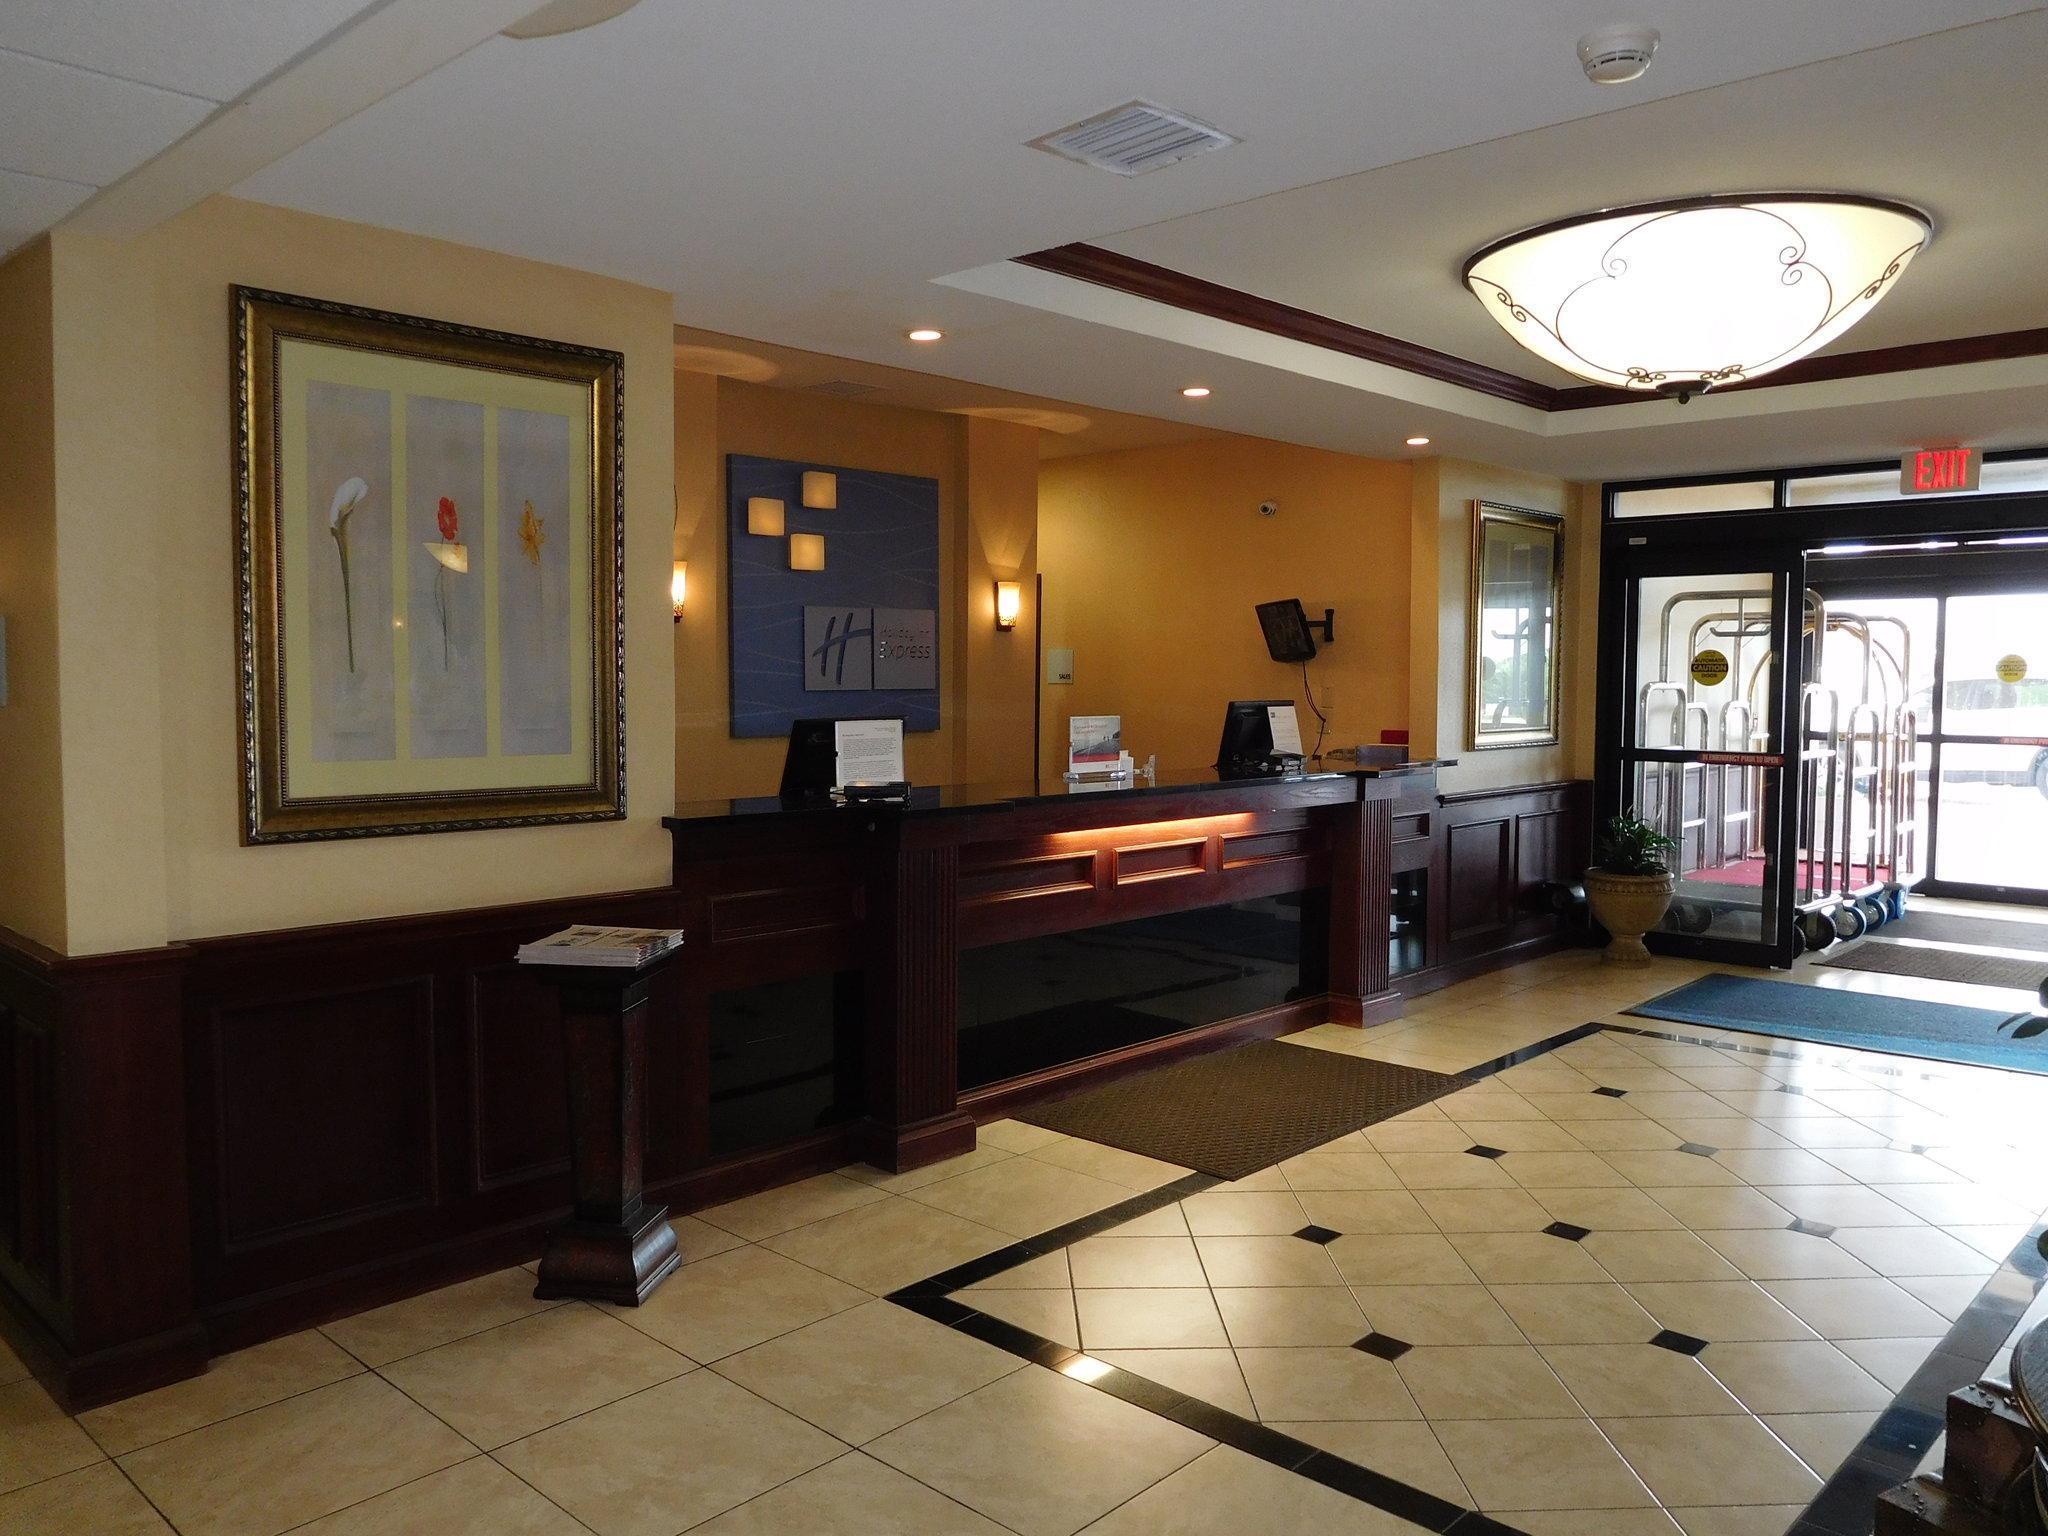 Holiday Inn Express Ponca City